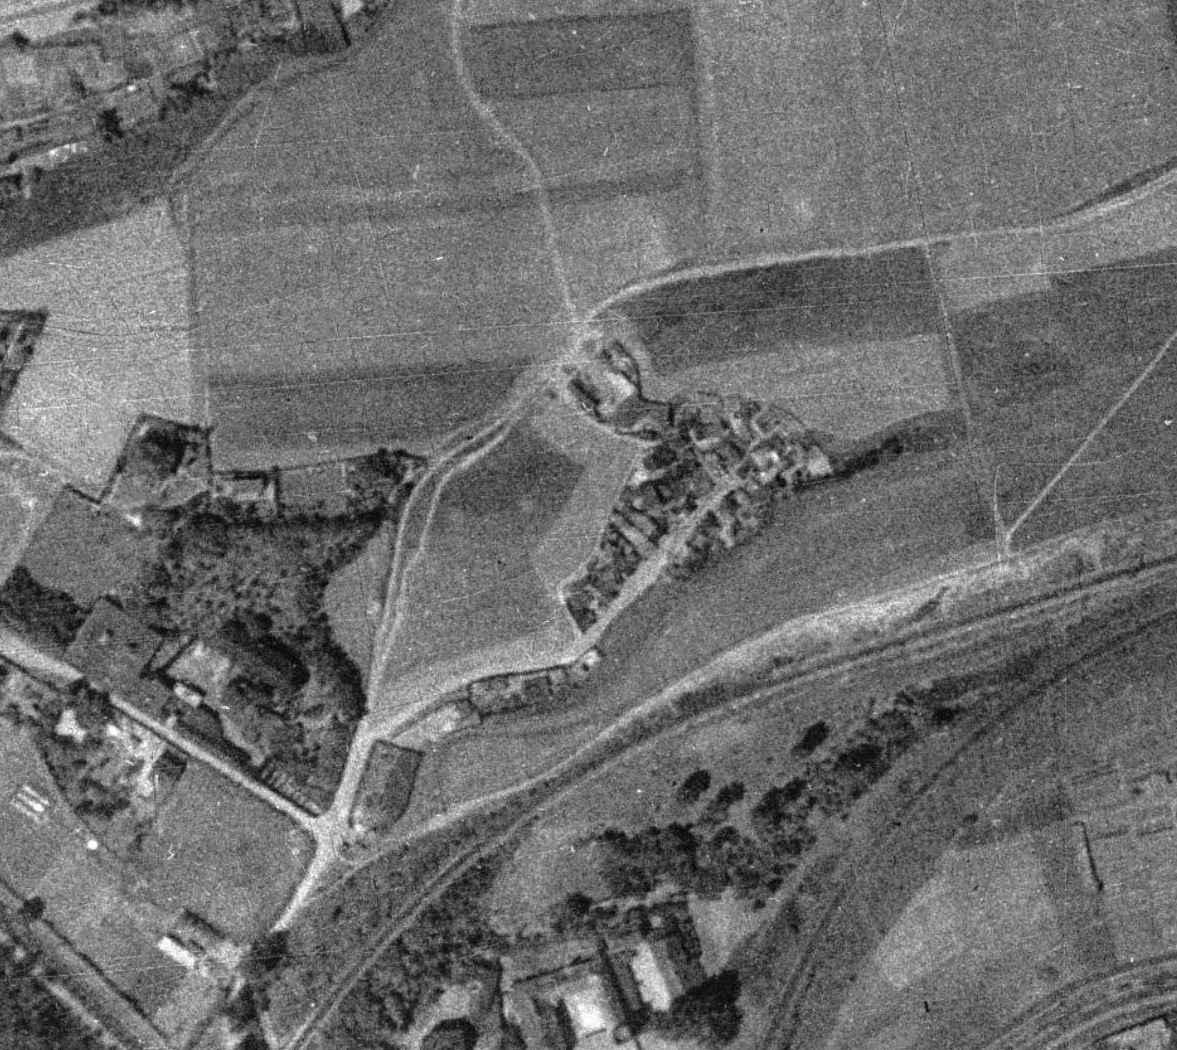 nouzova-kolonie-udoli-desu-letecky-snimek-1938